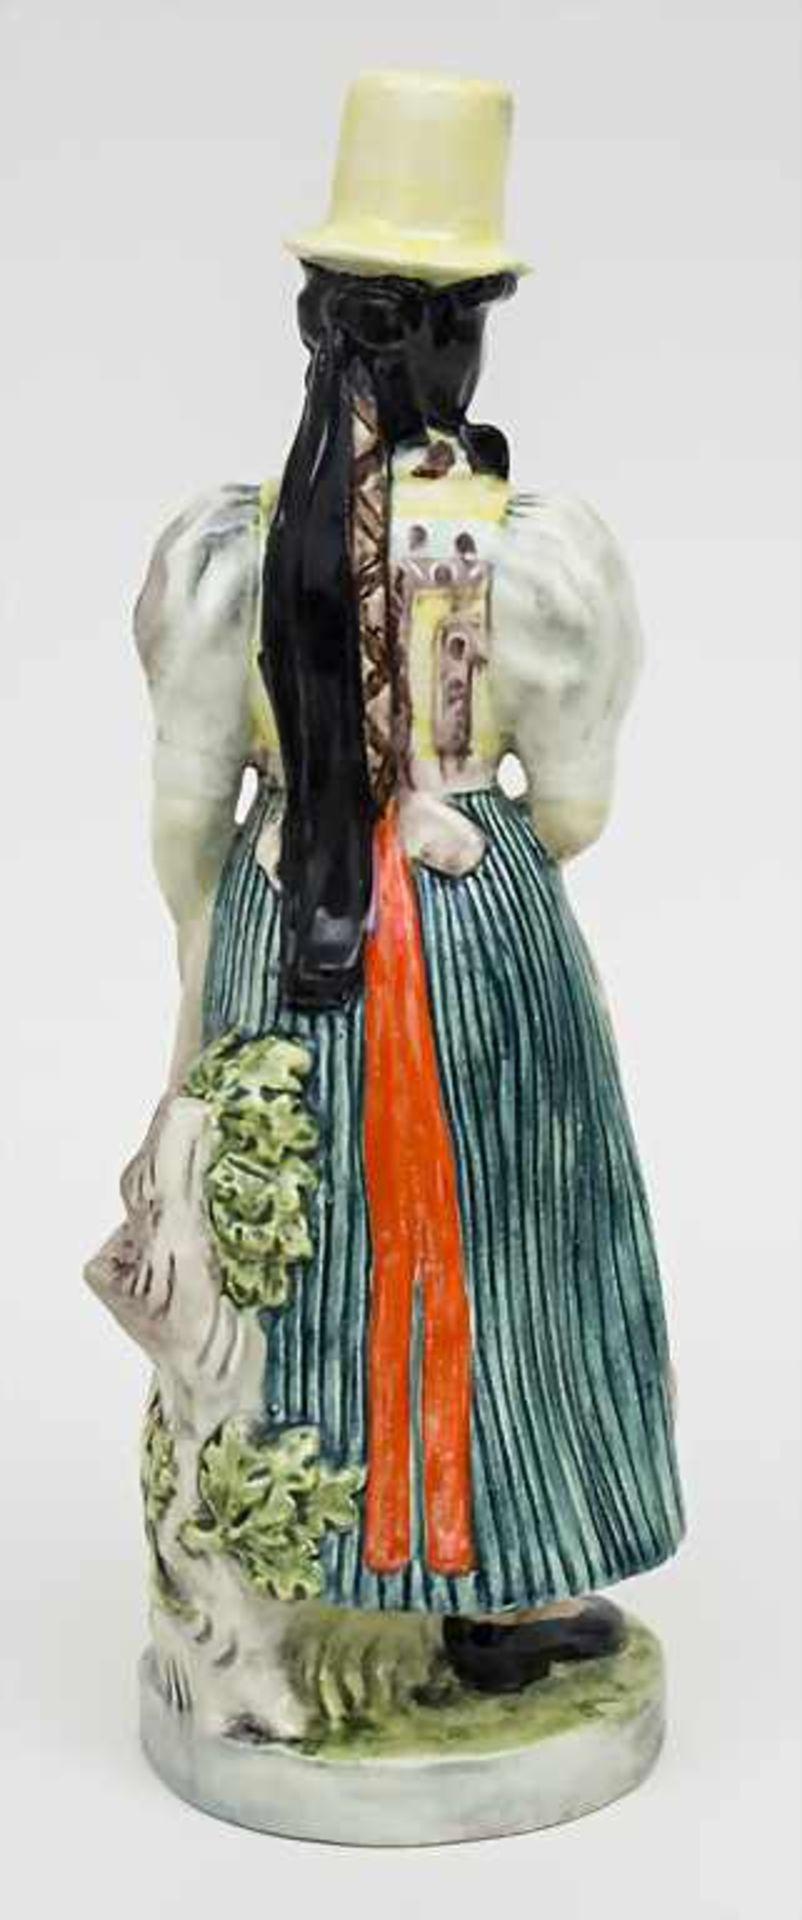 Trachtenfigur 'Tribergerin' / A costumed woman from Triberg, Karlsruher Majolika, um 1950 - Bild 3 aus 4